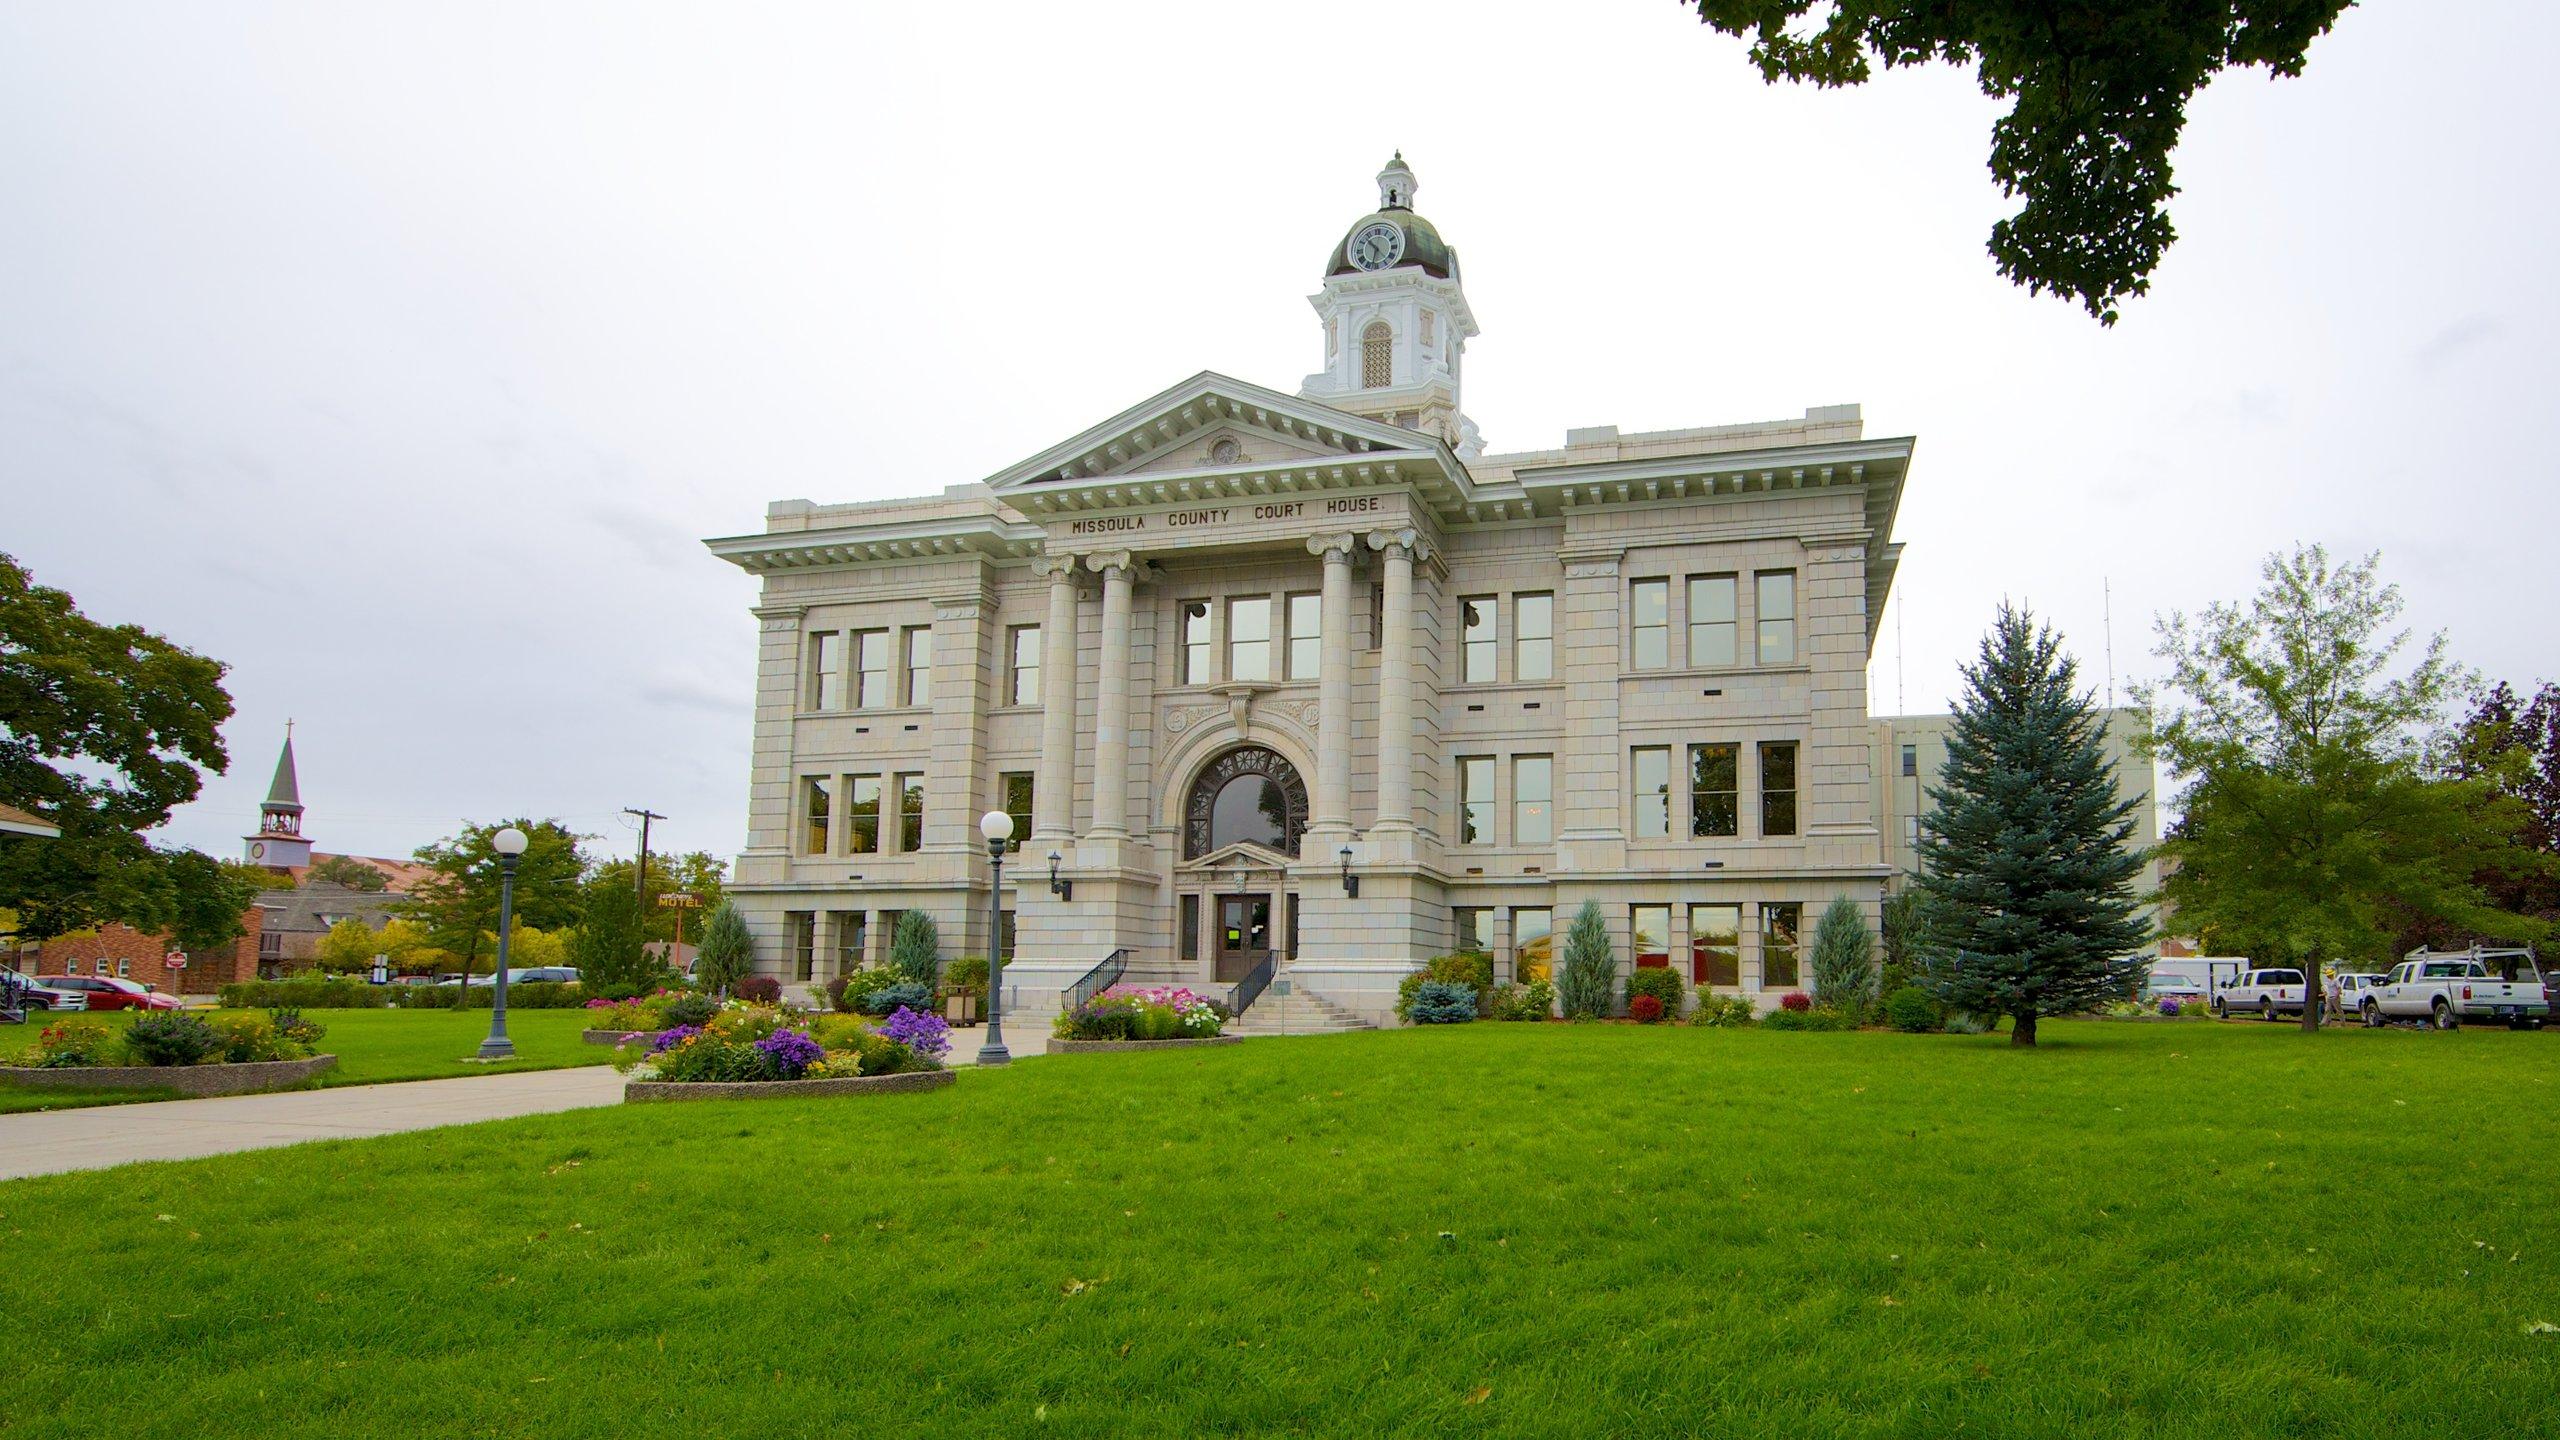 Missoula, Montana, United States of America